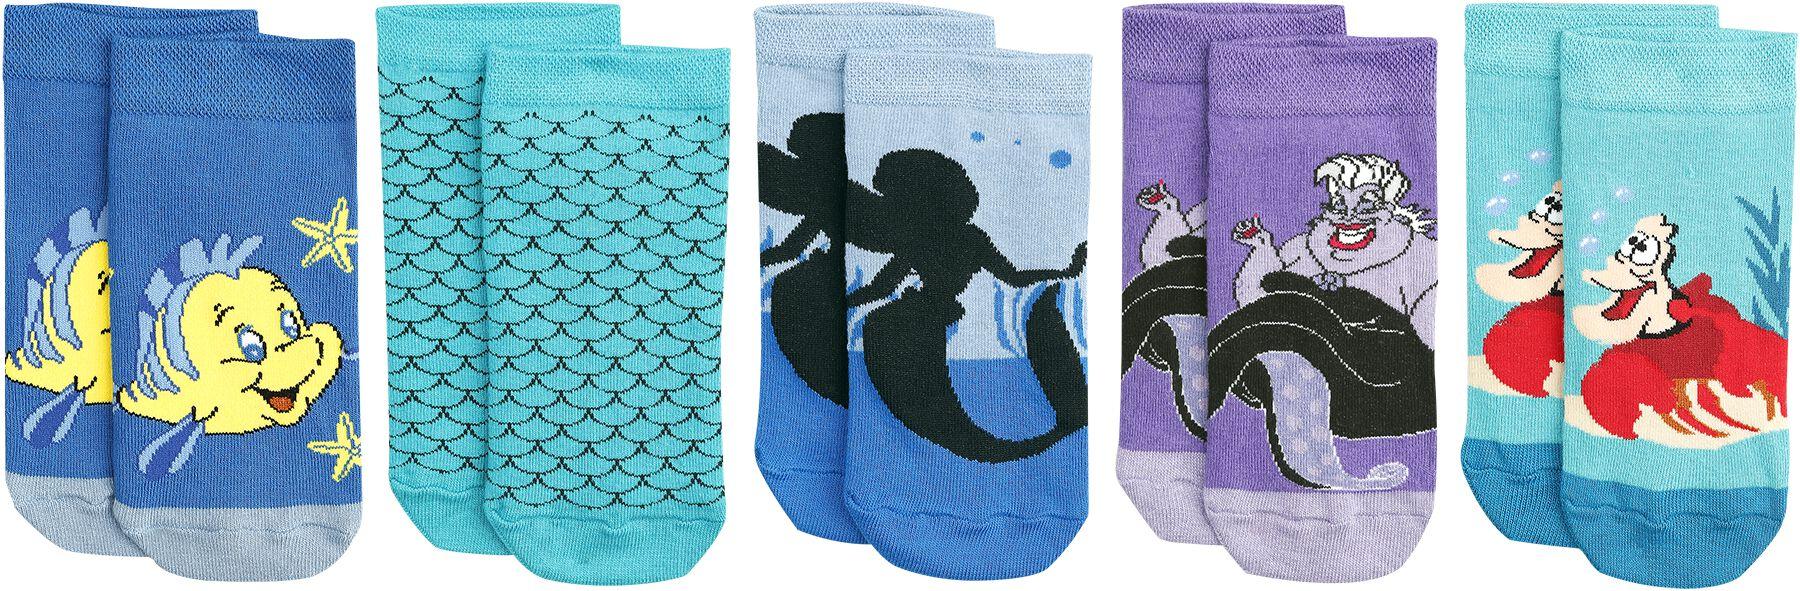 Socken für Frauen - Arielle die Meerjungfrau Sea Life Socken multicolor  - Onlineshop EMP